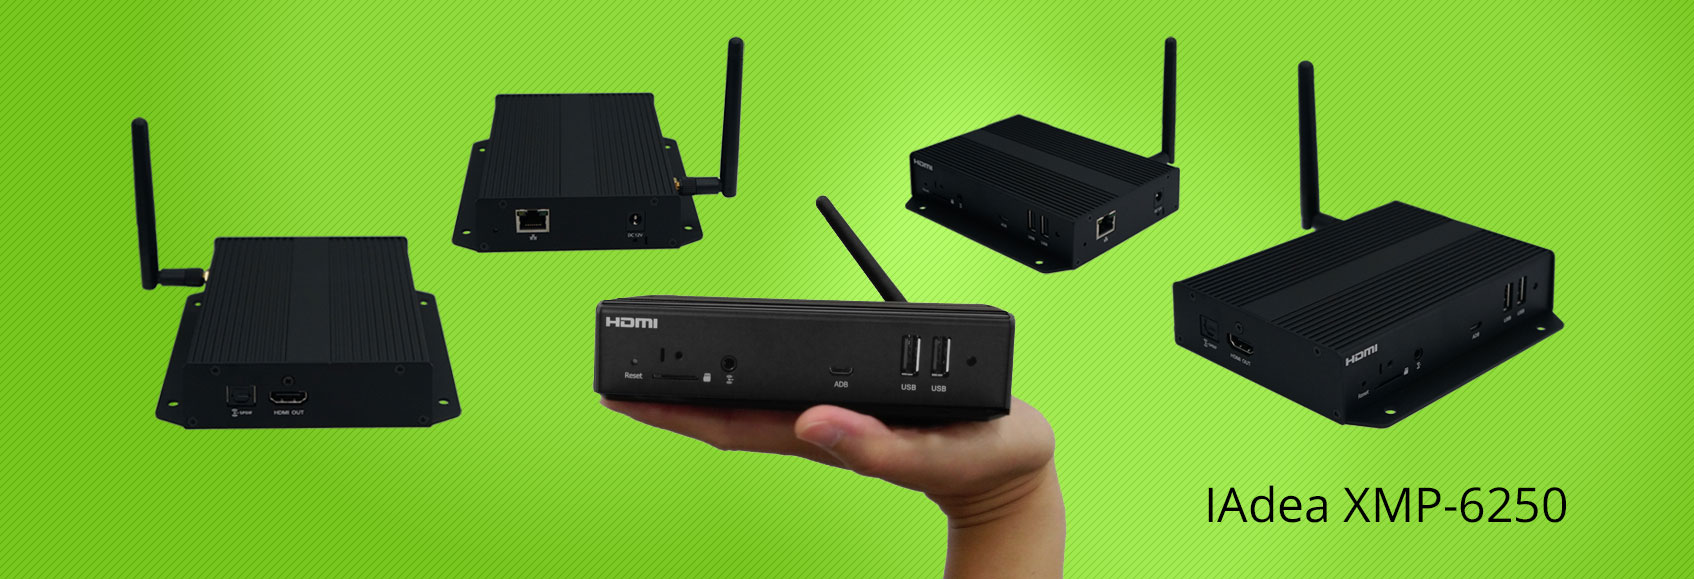 Mediaplayer-XMP-6250